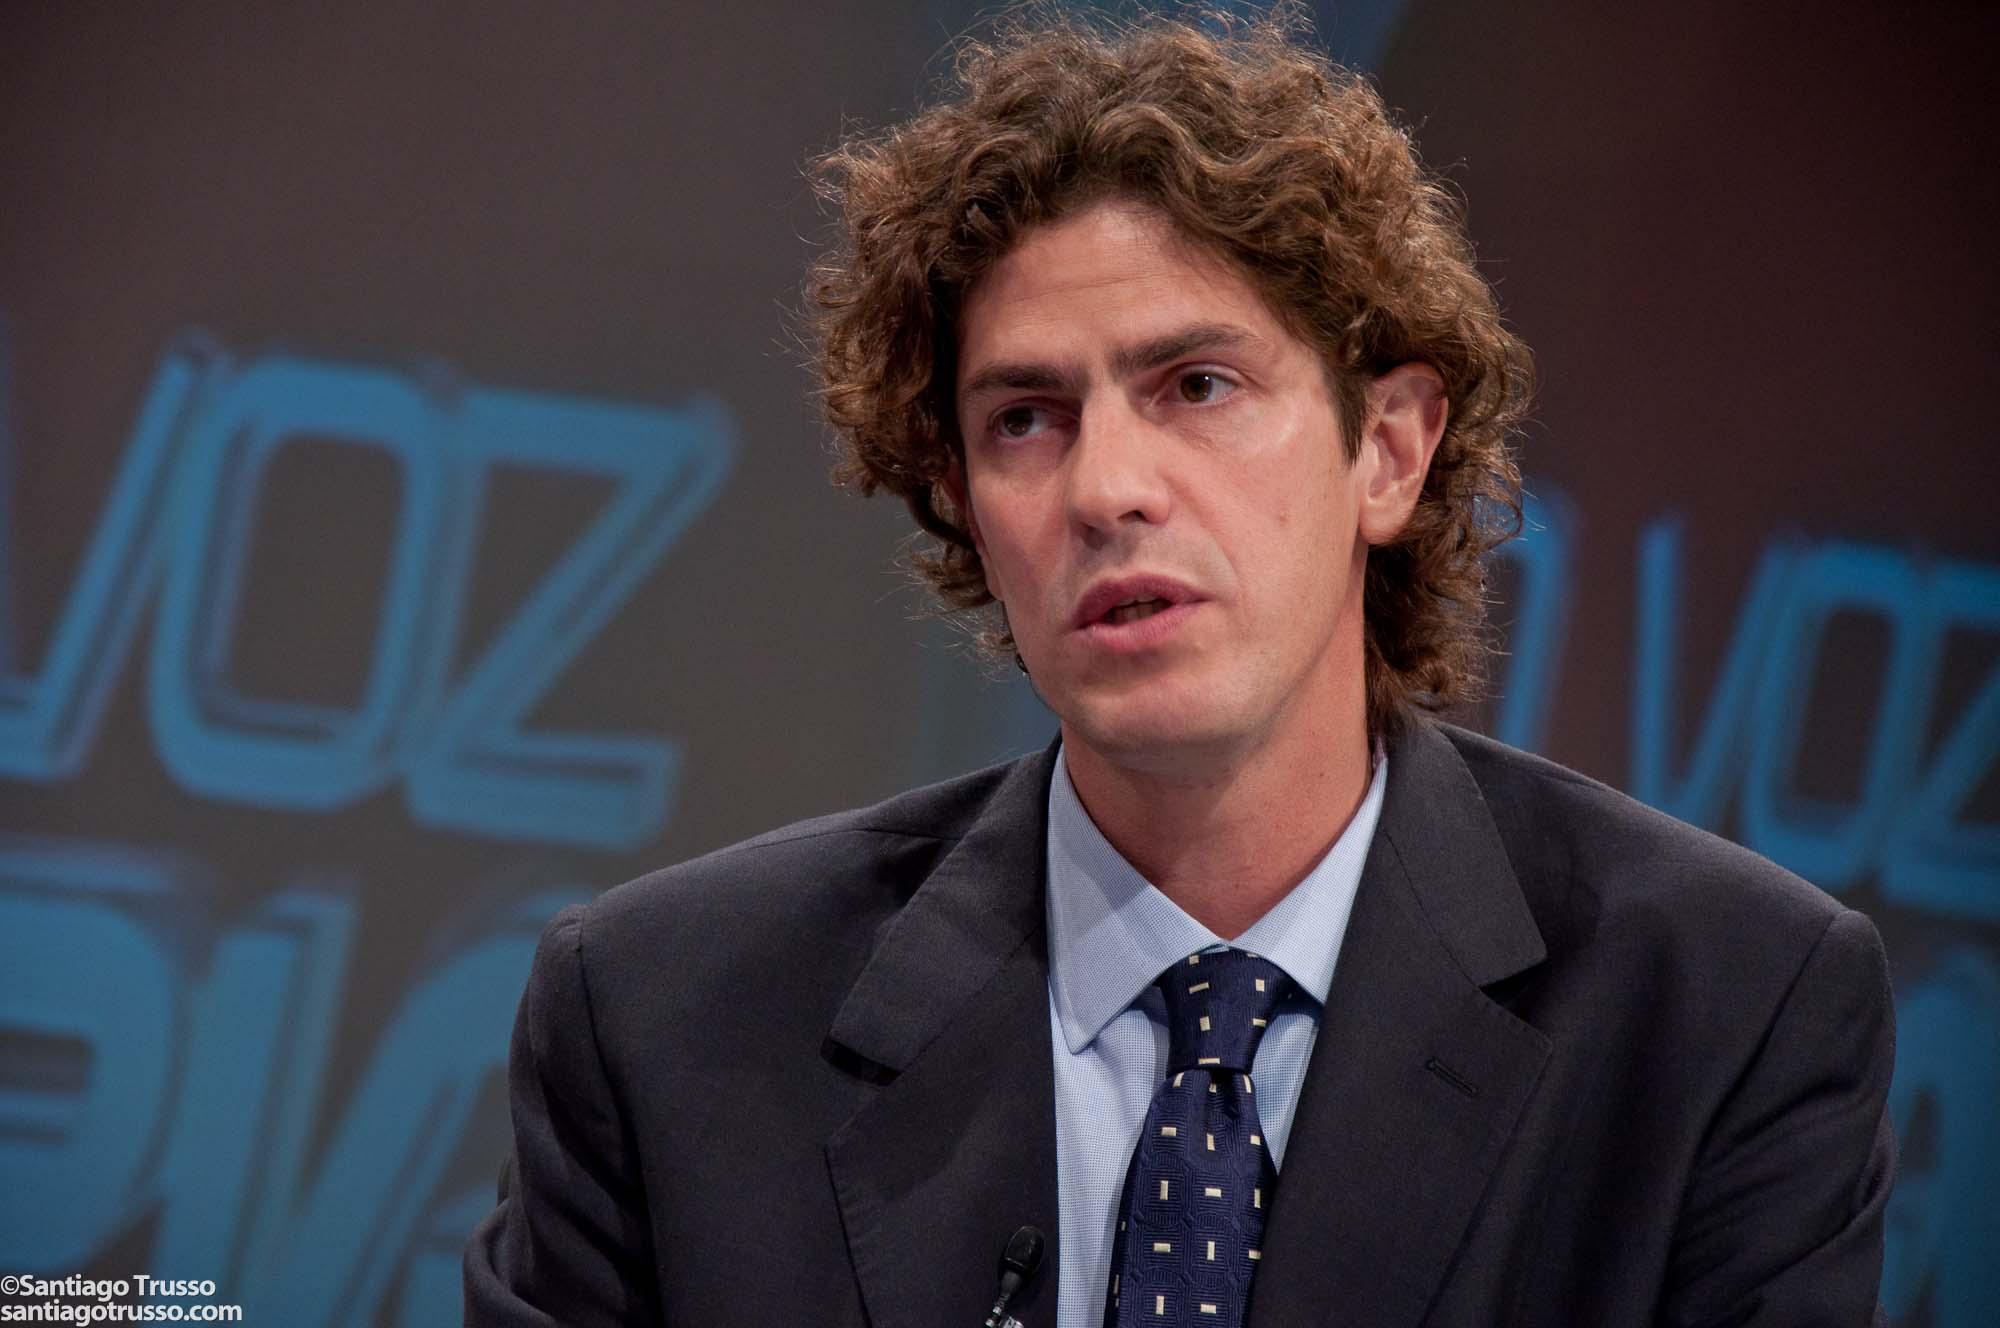 Martín Lousteau responsabilizó al gobierno por la candidatura de Cristina Fernández